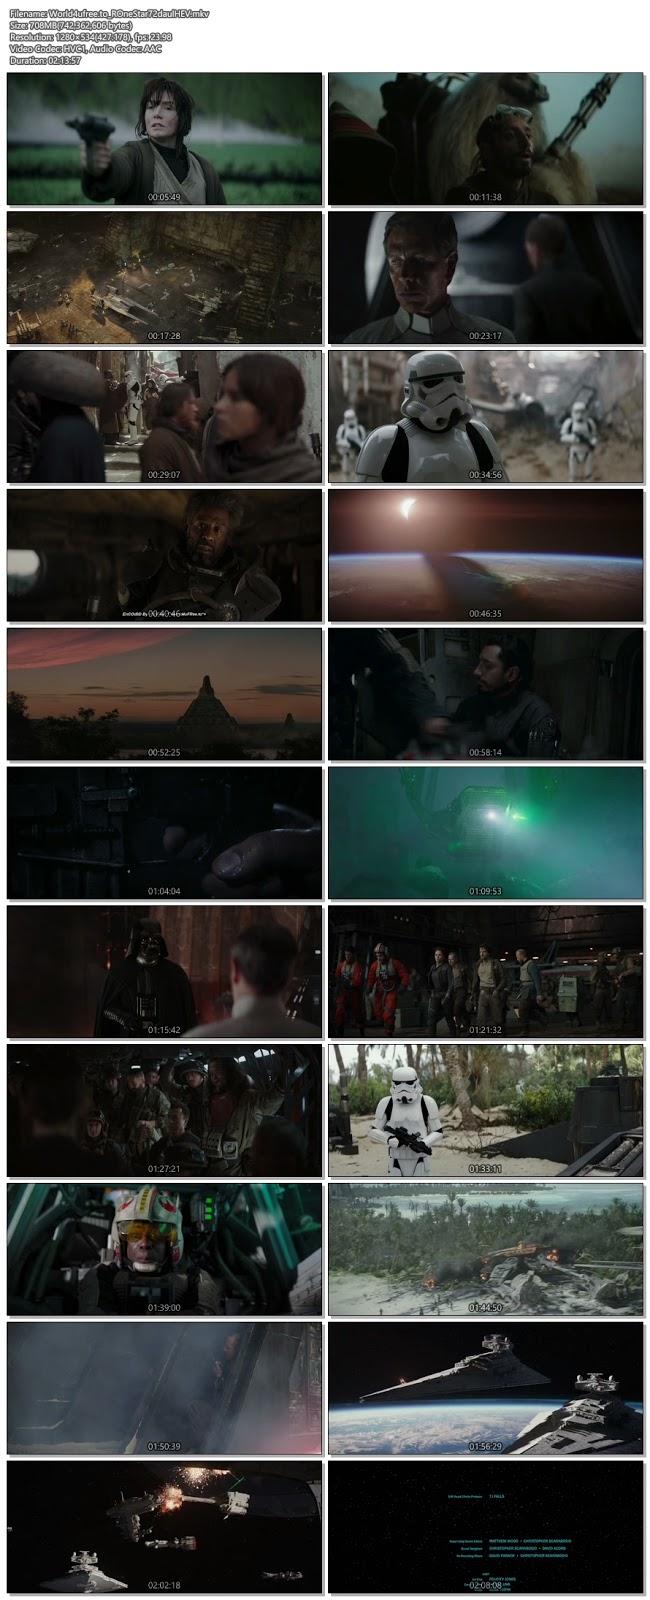 Rogue One A Star Wars Story 2018 Daul Audio 720p BRRip 700Mb HEVC x265